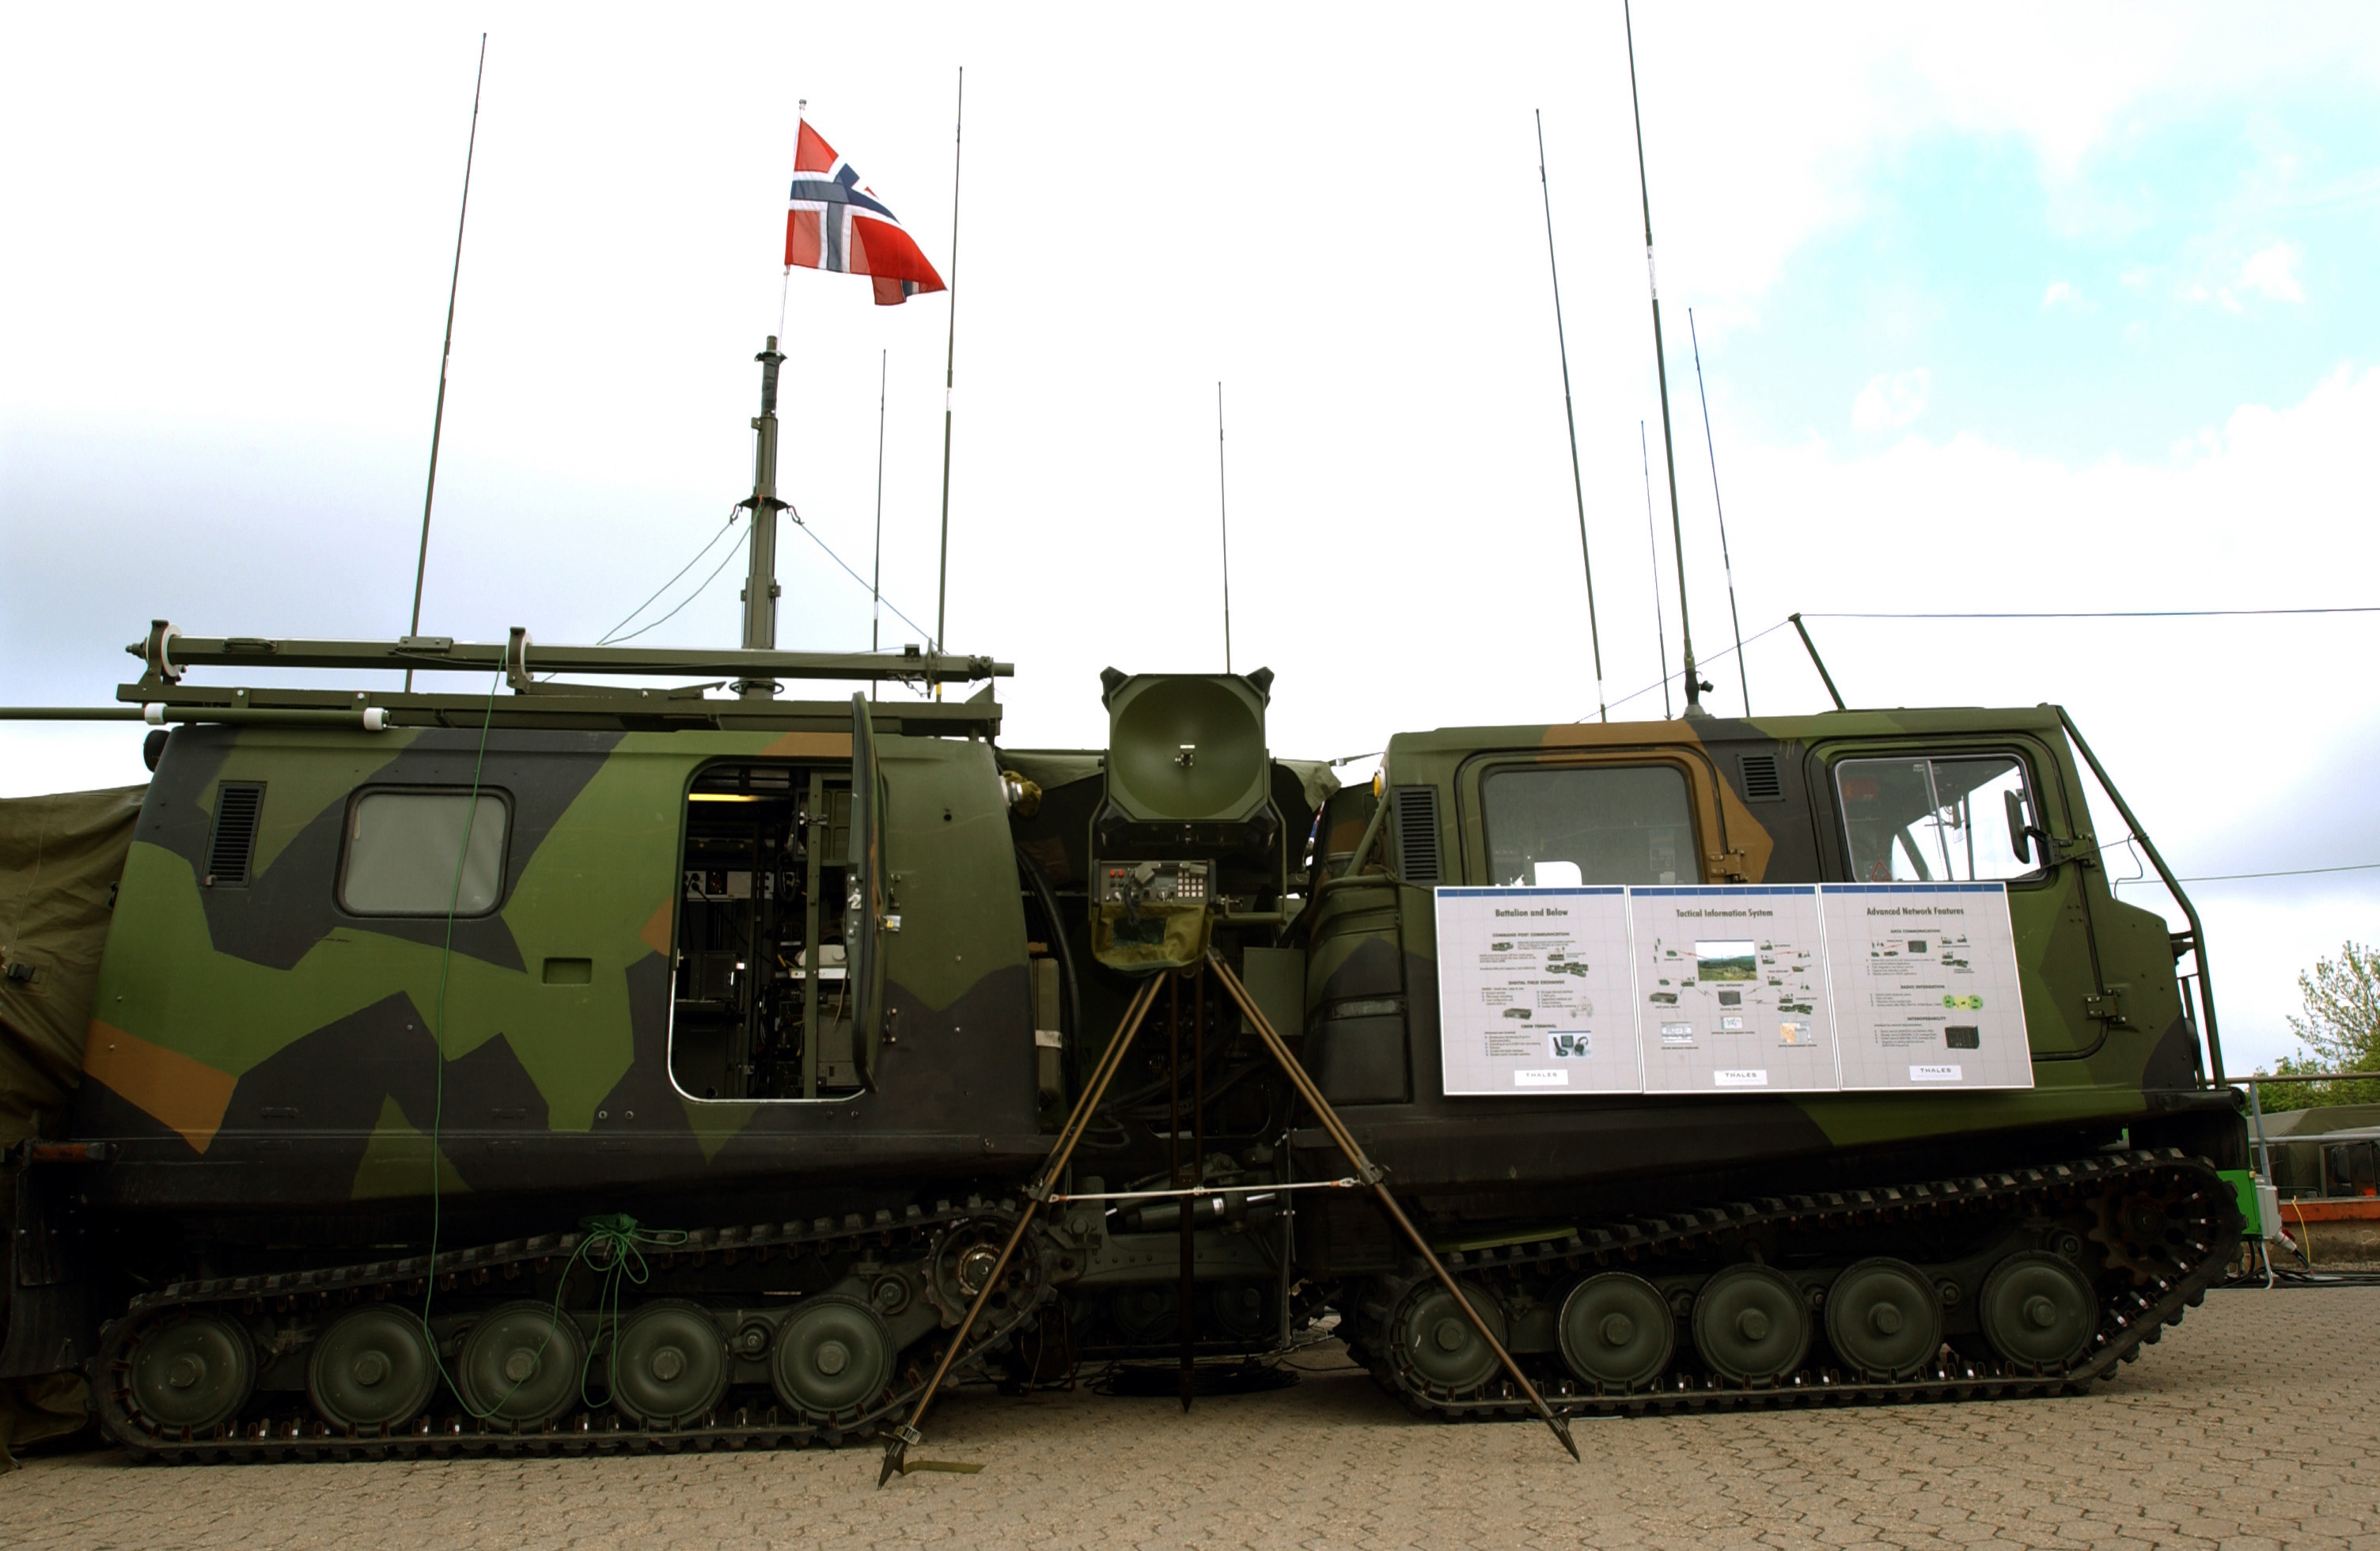 Wolldecke Norwegische Armee : File bv command vehicle g wikimedia commons